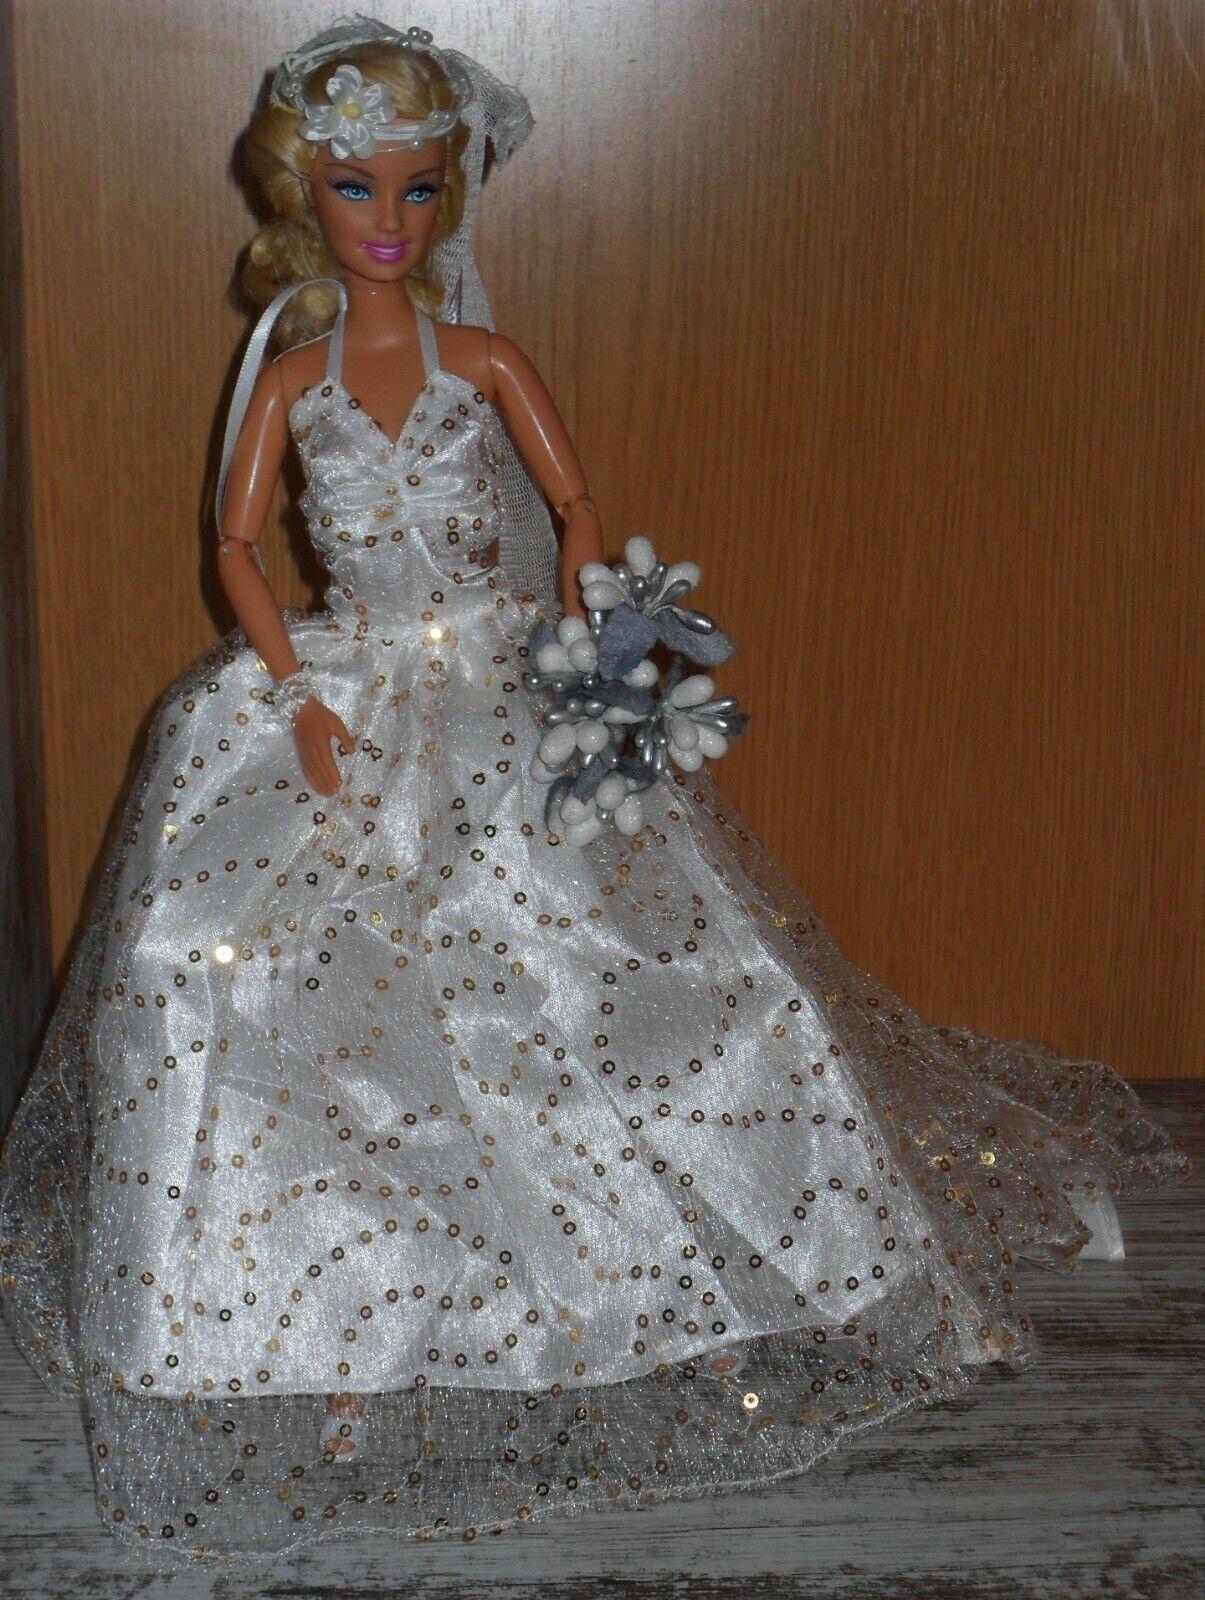 Muñeca Barbie mattel articulada con Vestido de Novia, accesorios, peana, boda